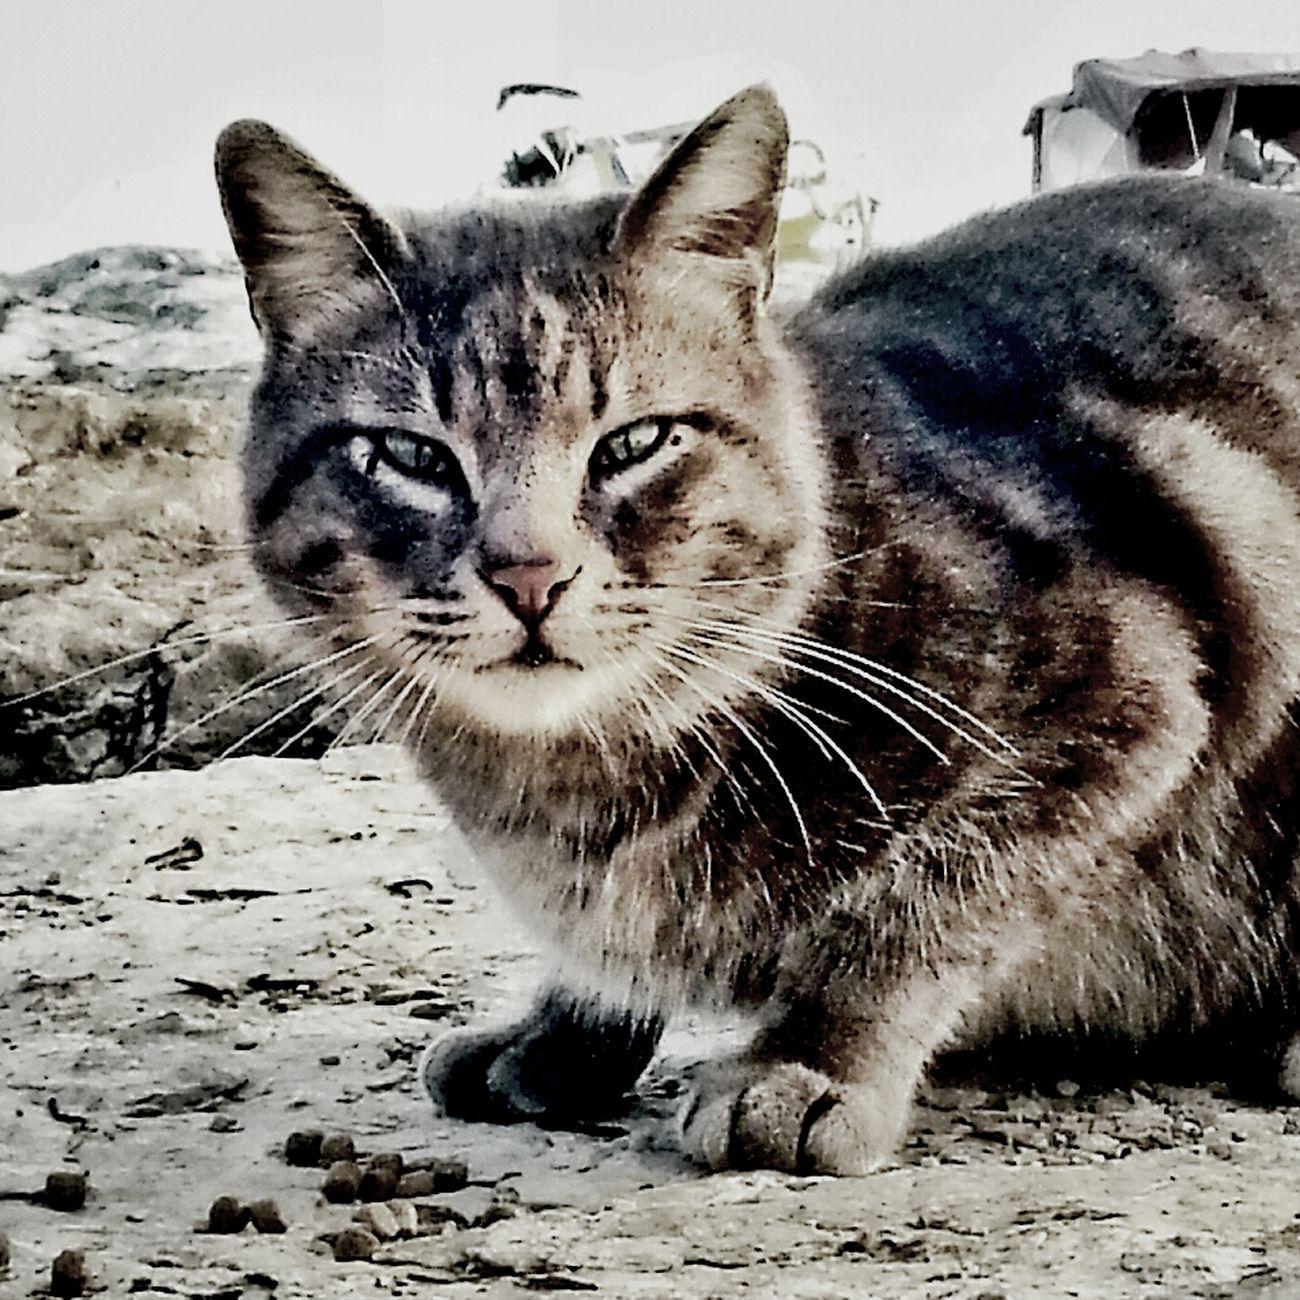 Cat Streetphotography Cats Taking Photos TheMinimals (less Edit Juxt Photography) Kedi Kedidir Kedi Bisgen